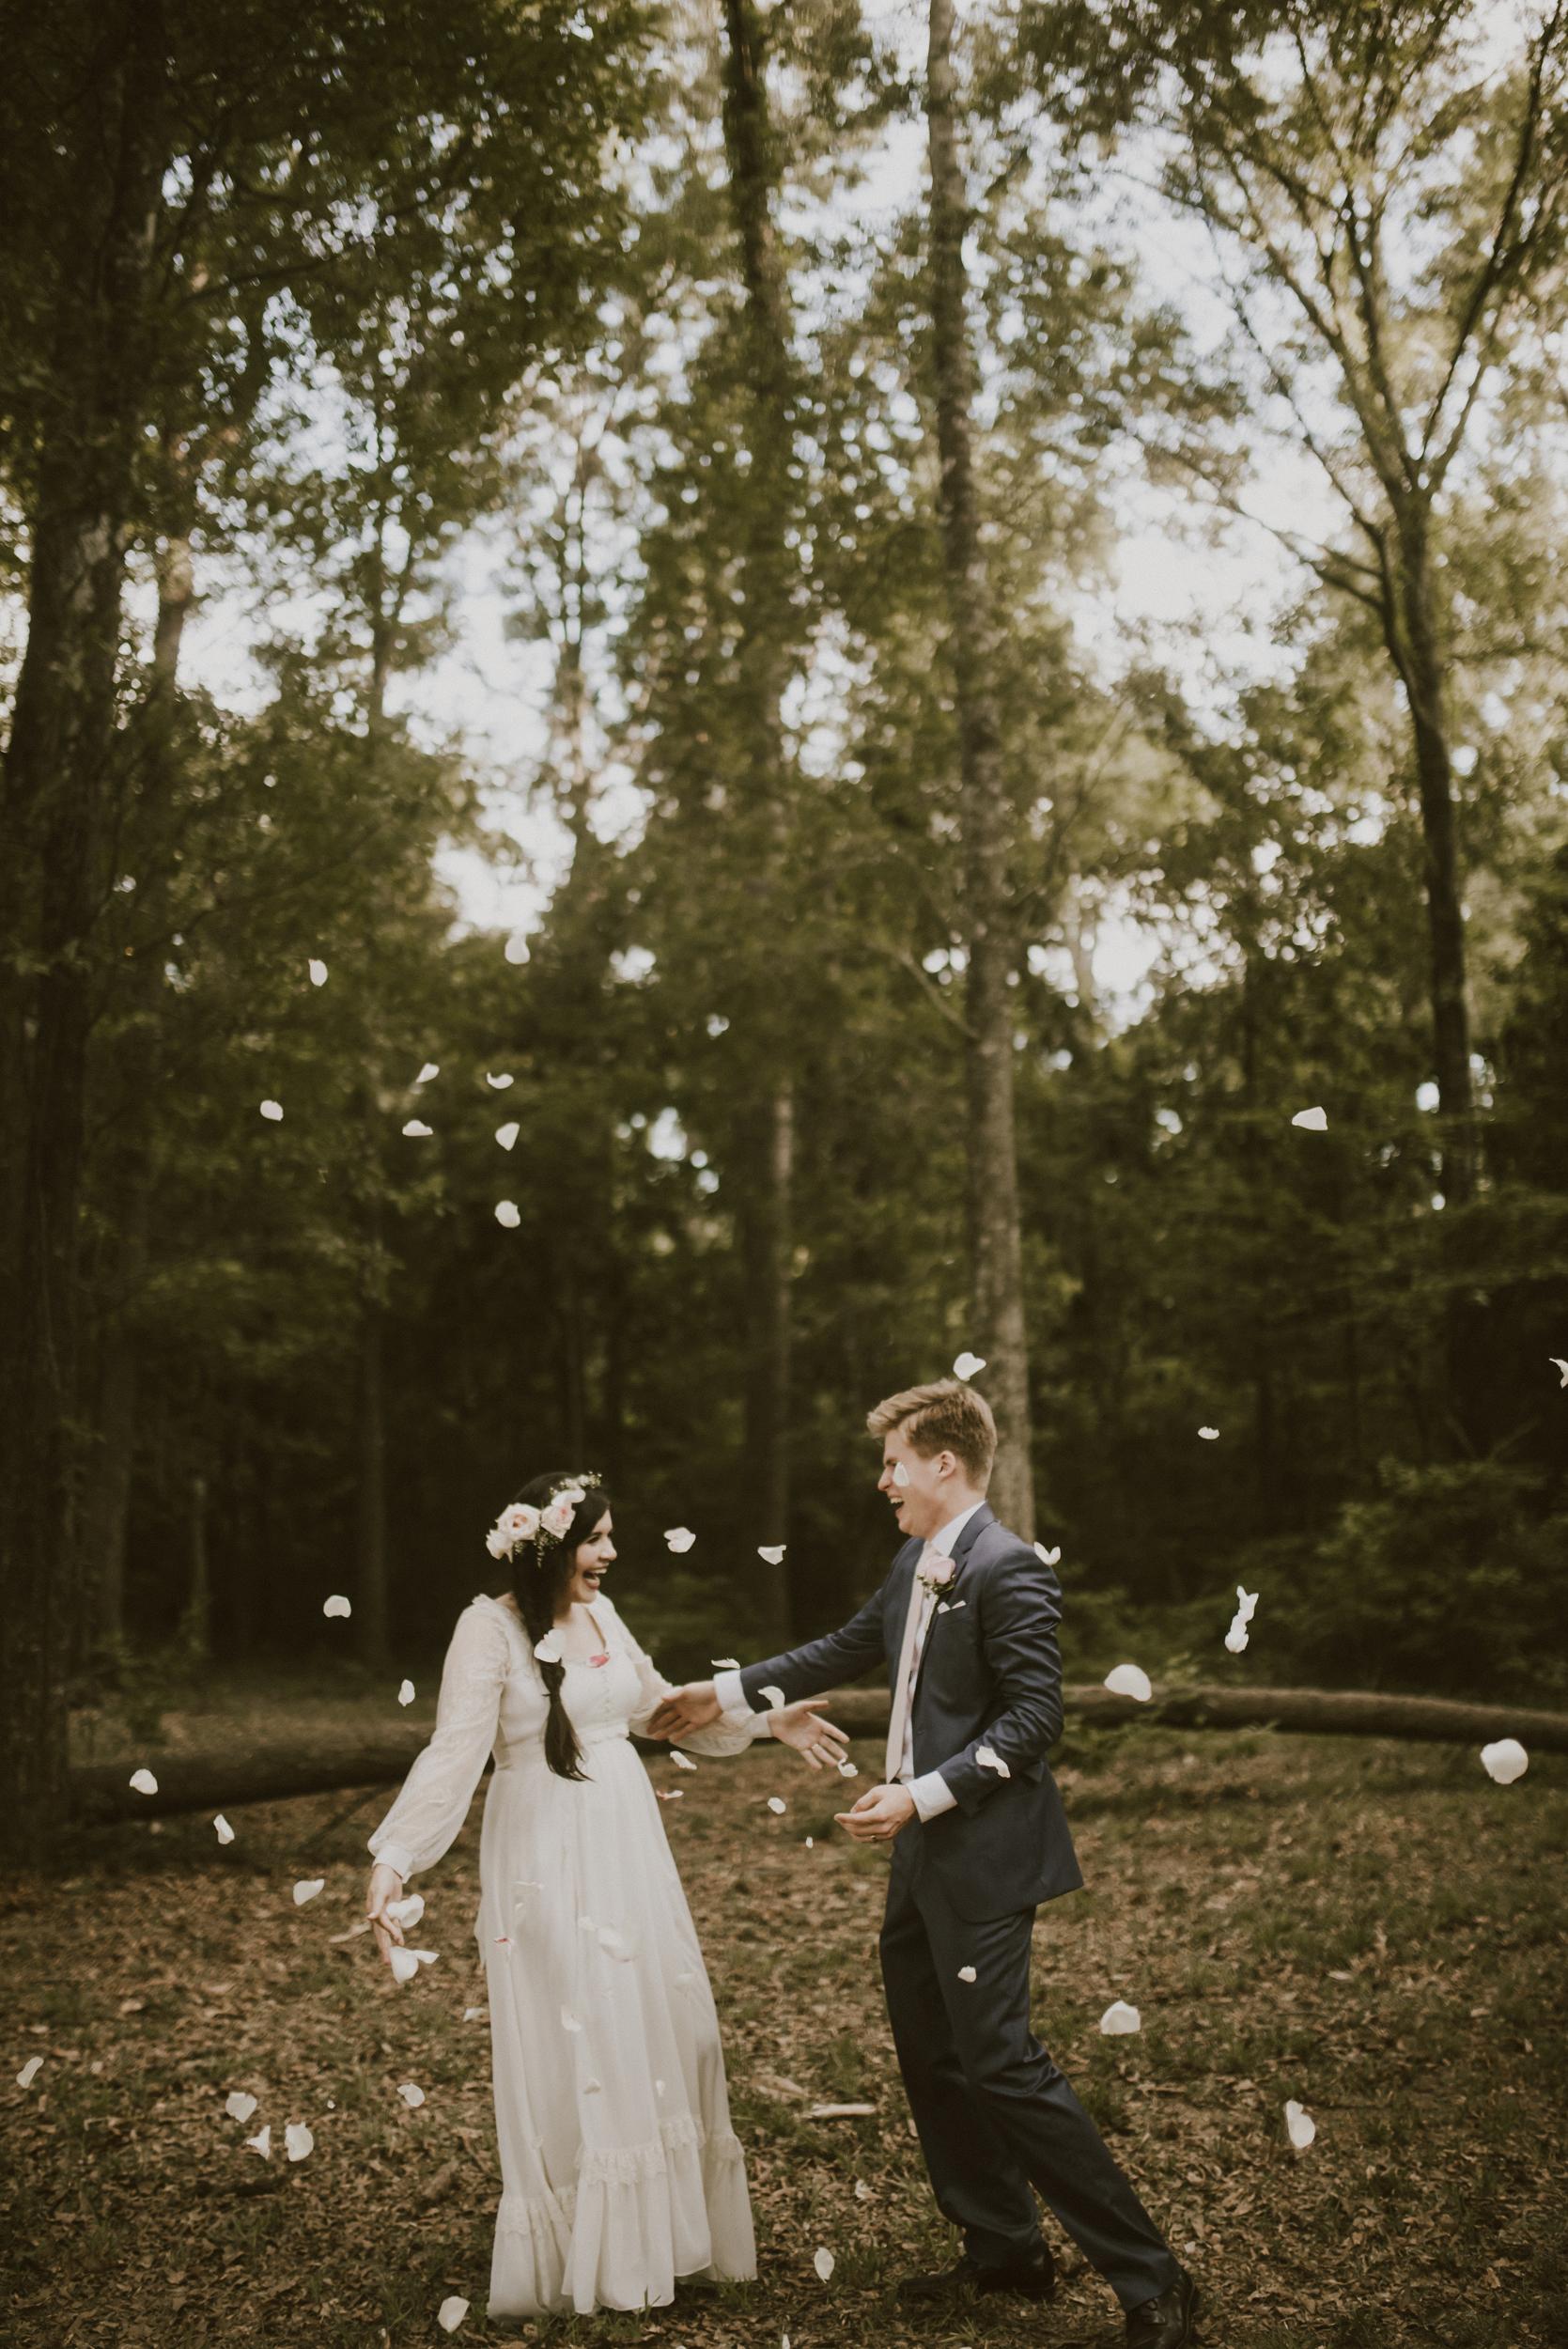 ofRen_weddingphotographer-143.jpg